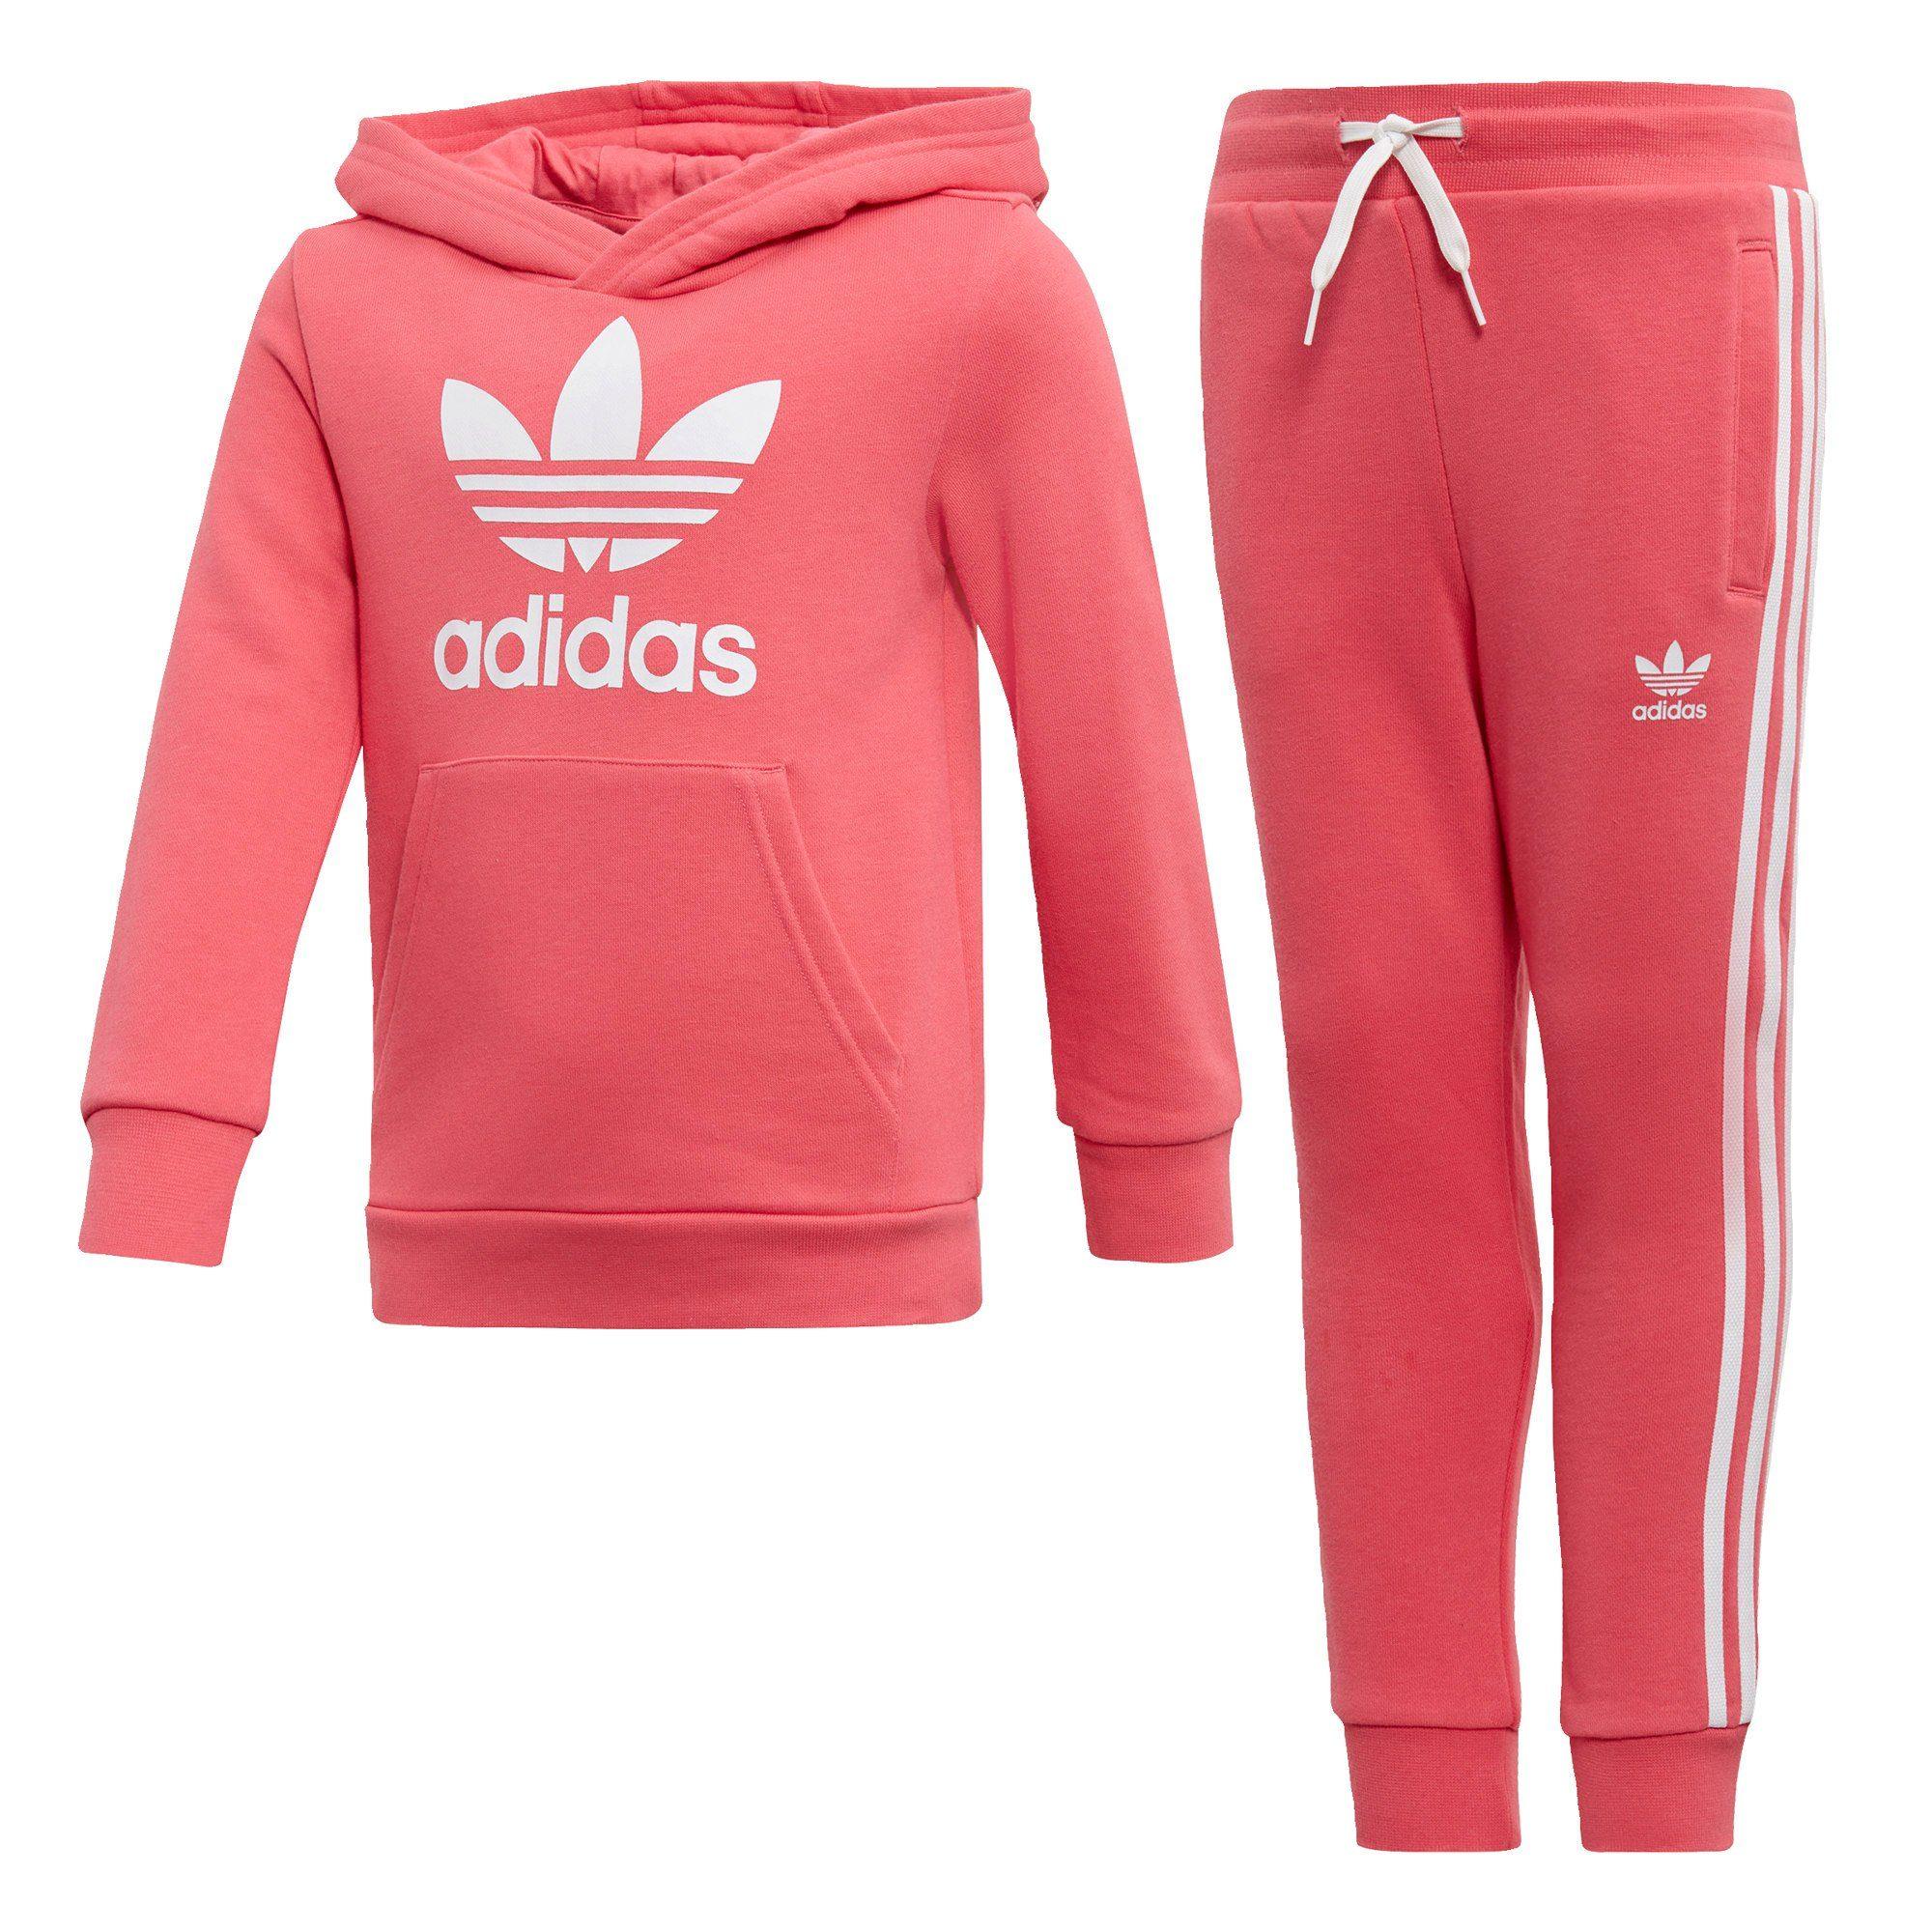 adidas Originals Trainingsanzug »Trefoil Hoodie Set«, adicolor online kaufen   OTTO